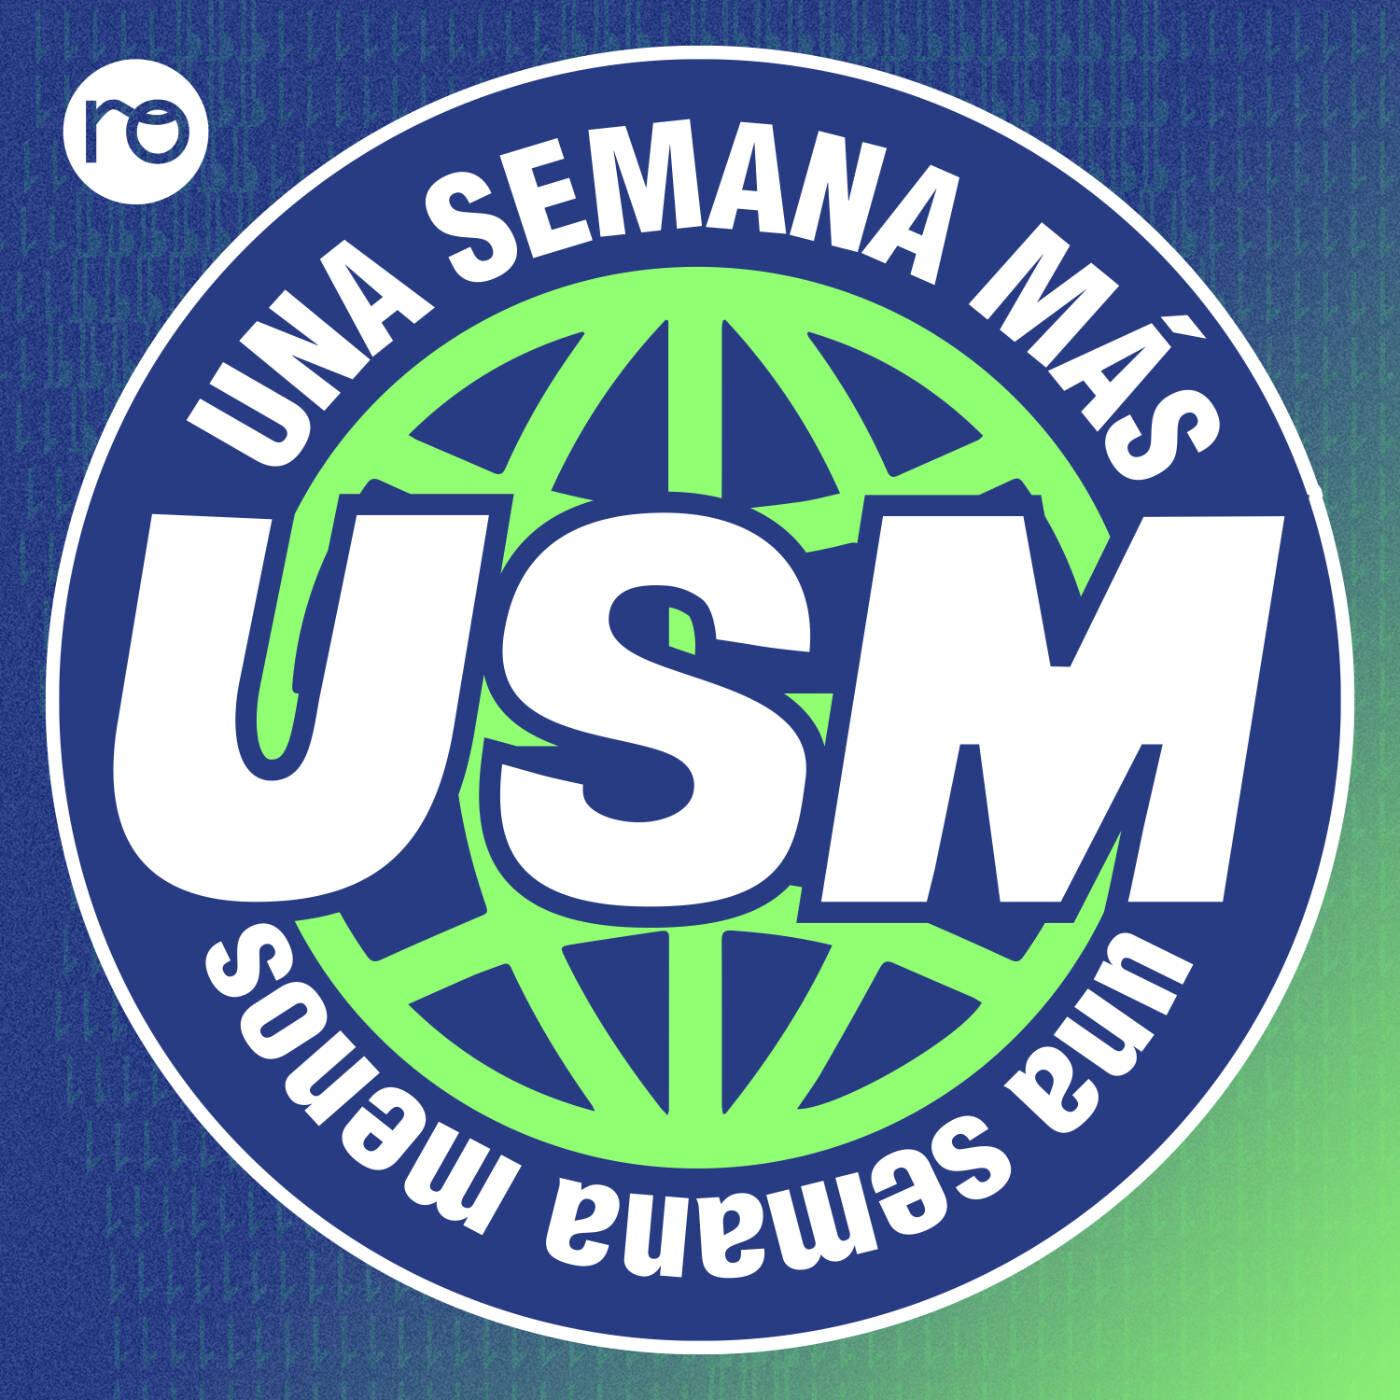 USM #16: LNG/SHT Galaxia Cero, Bestia Bebé, Crewrod, Joaquín Plada ft. Julián Kartún, Paul Higgs